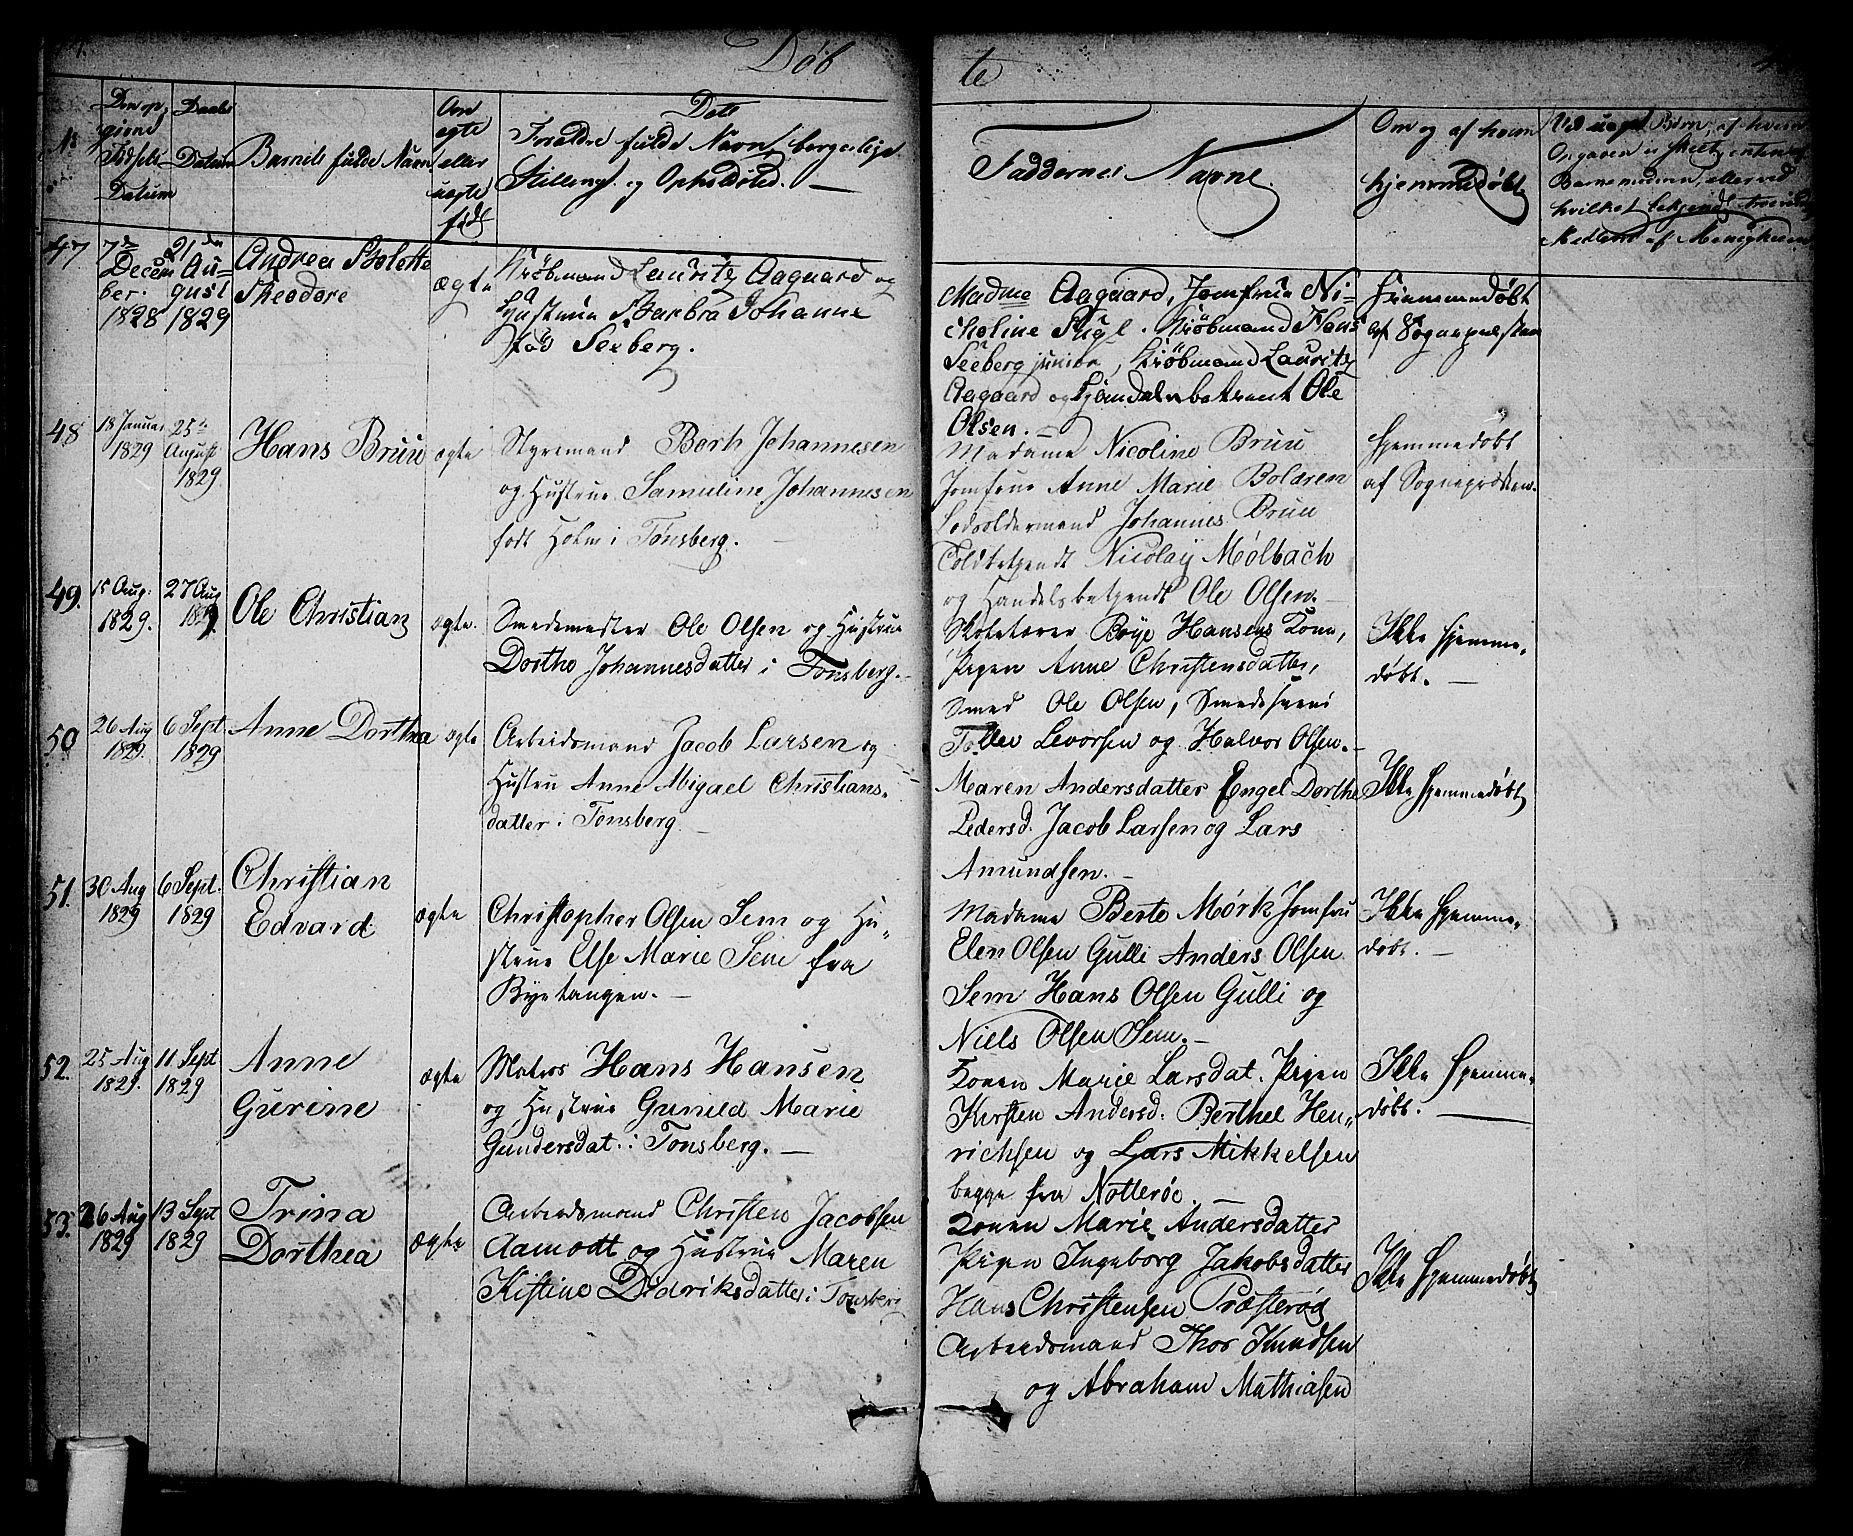 SAKO, Tønsberg kirkebøker, F/Fa/L0005: Ministerialbok nr. I 5, 1827-1836, s. 44-45